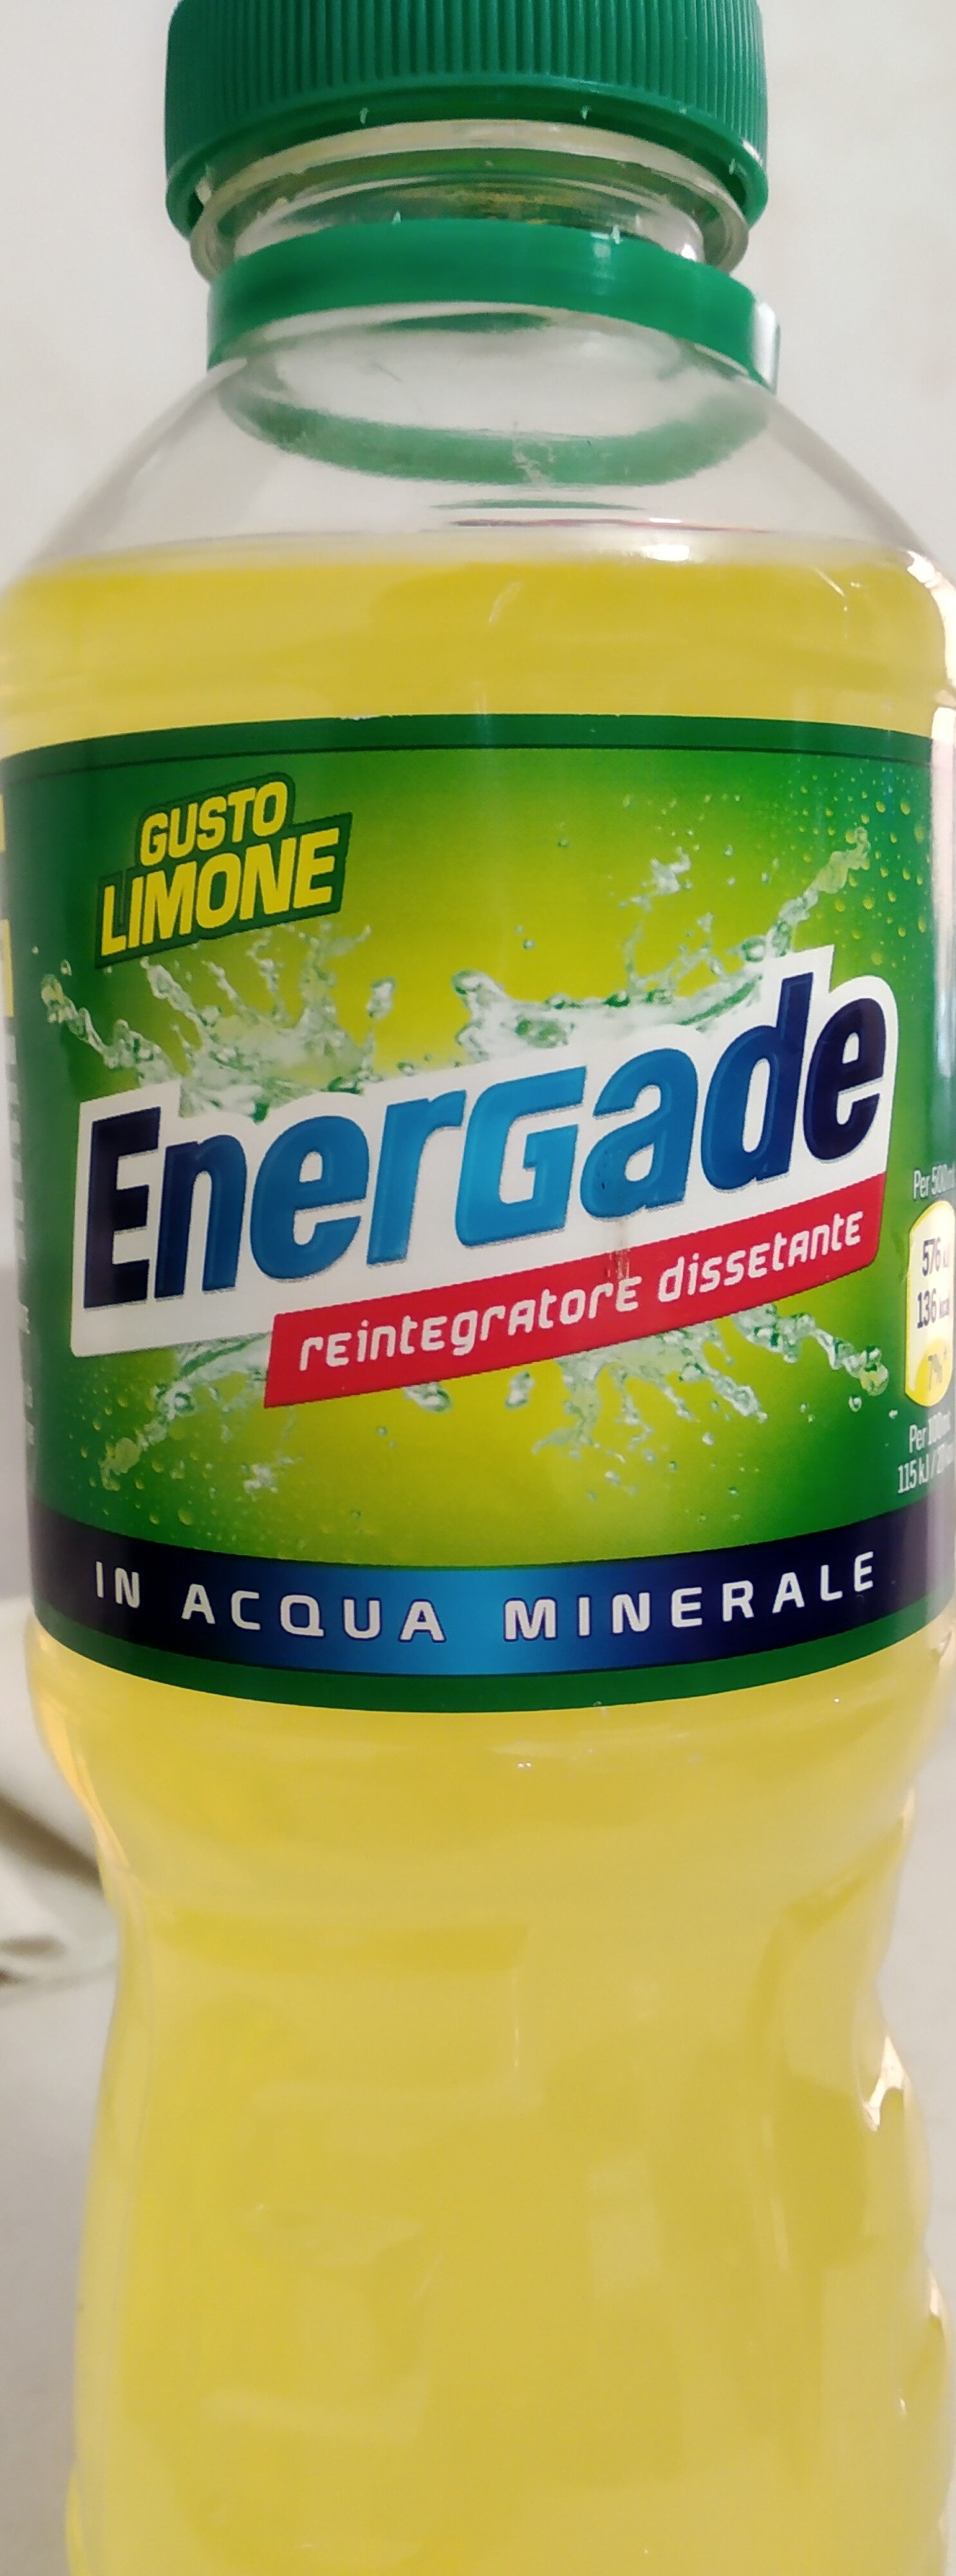 Energade limone - Producto